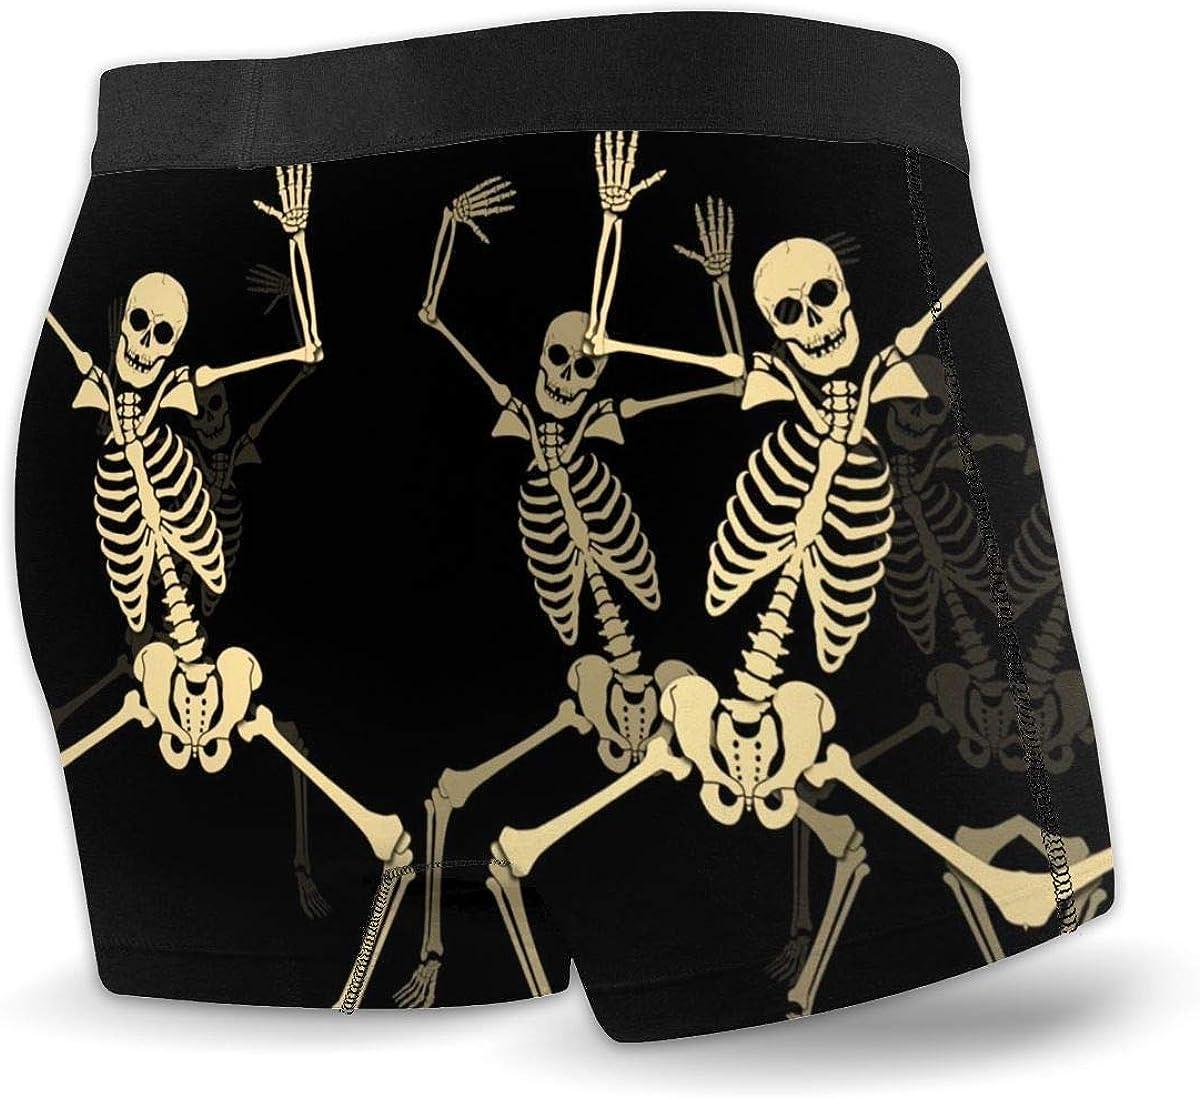 Funny Comfort Soft Underwear//Underpants SyrinXPan Skull Boxer Briefs for Men